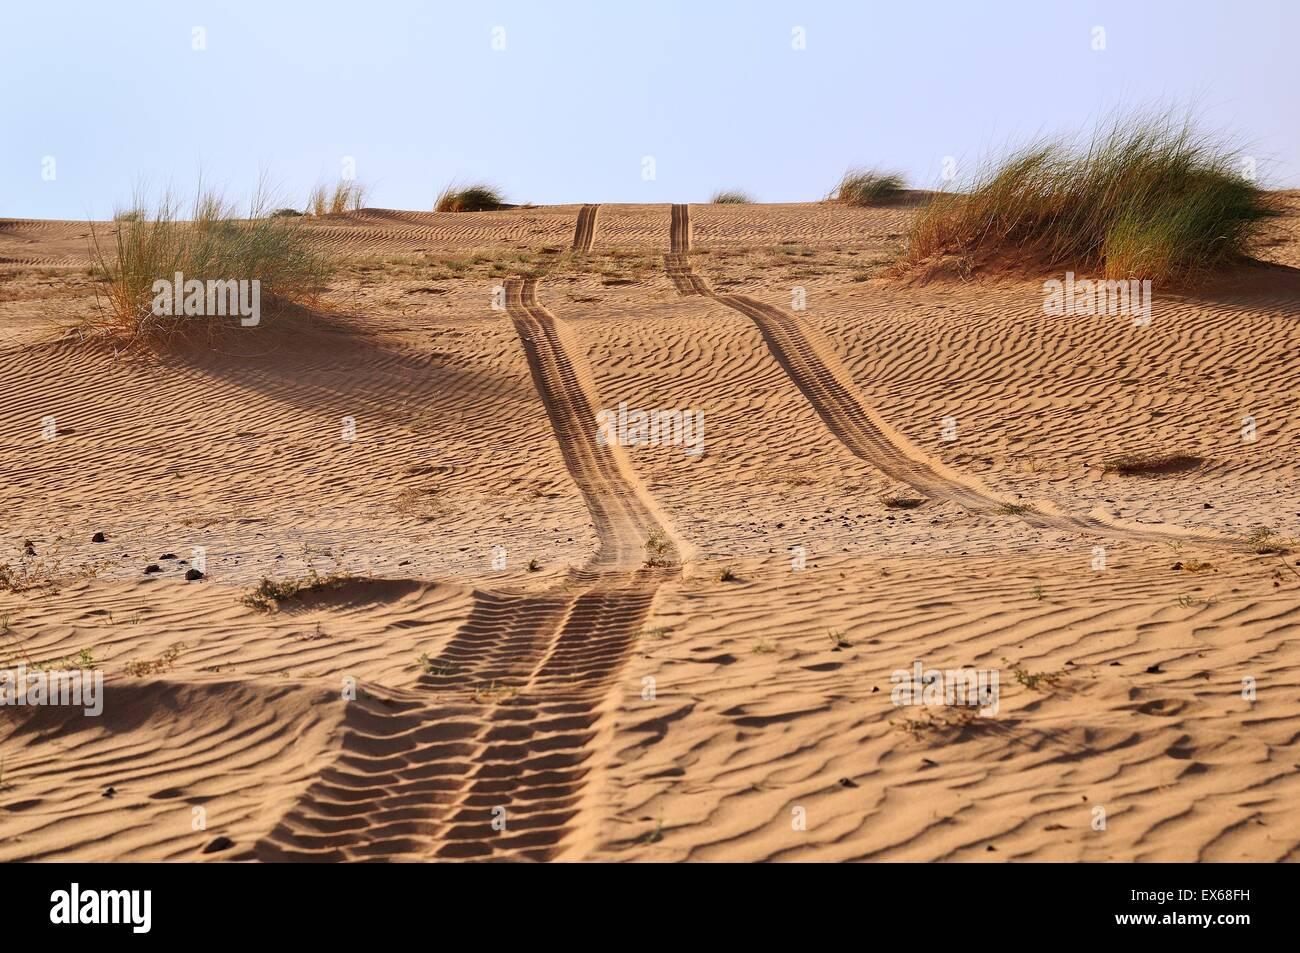 Tire tracks in the desert sand, route from Atar to Tidjikja, Adrar region, Mauritania - Stock Image